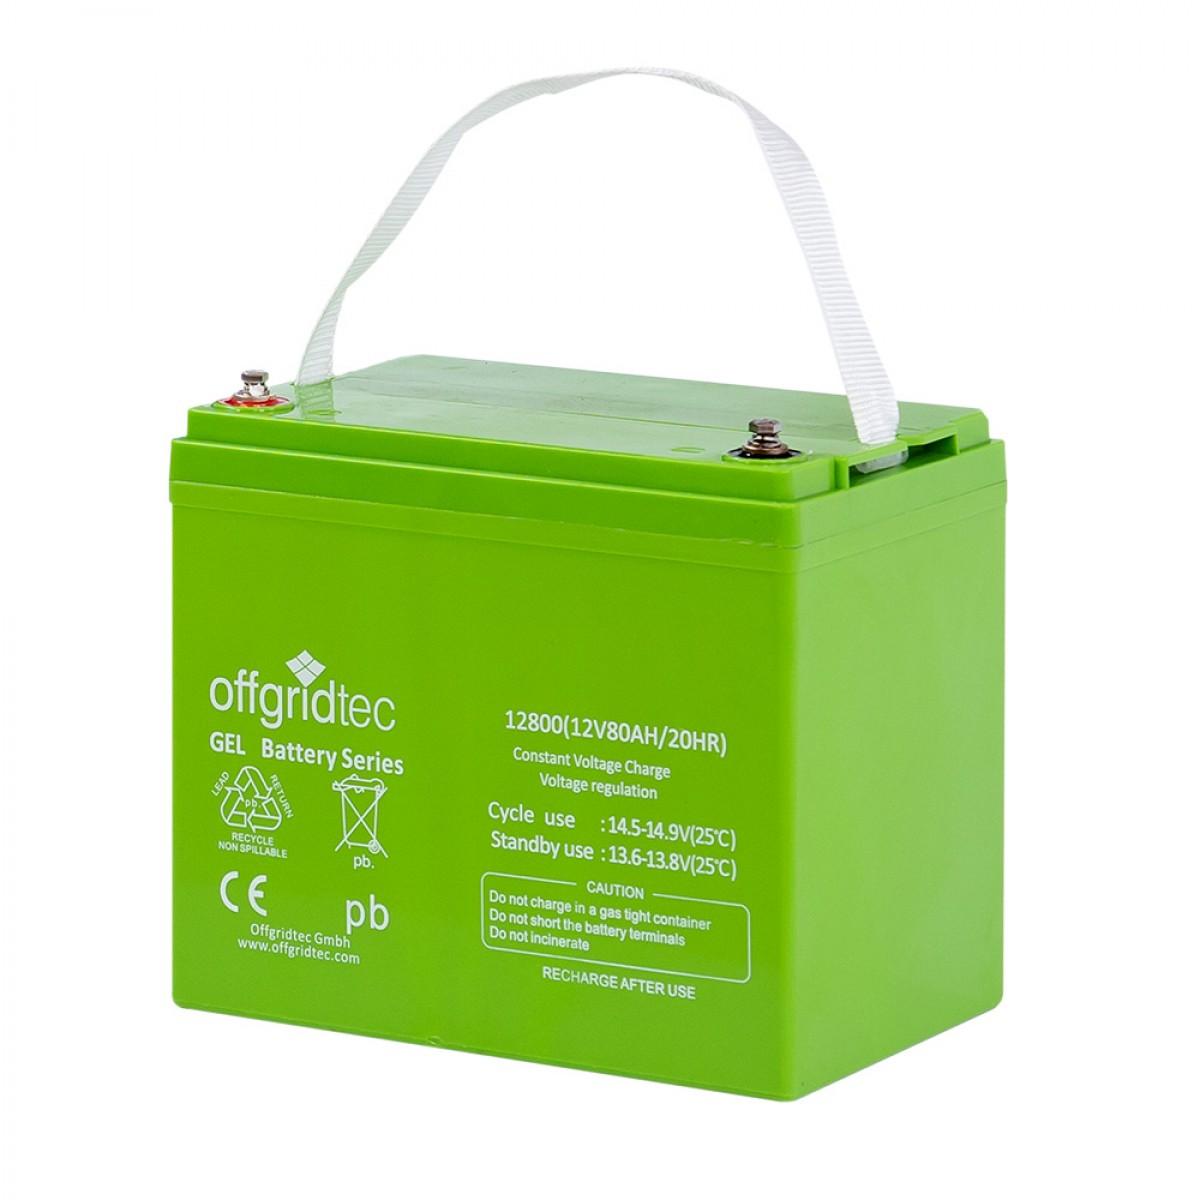 Offgridtec Gelbatterie 12V 80Ah 3